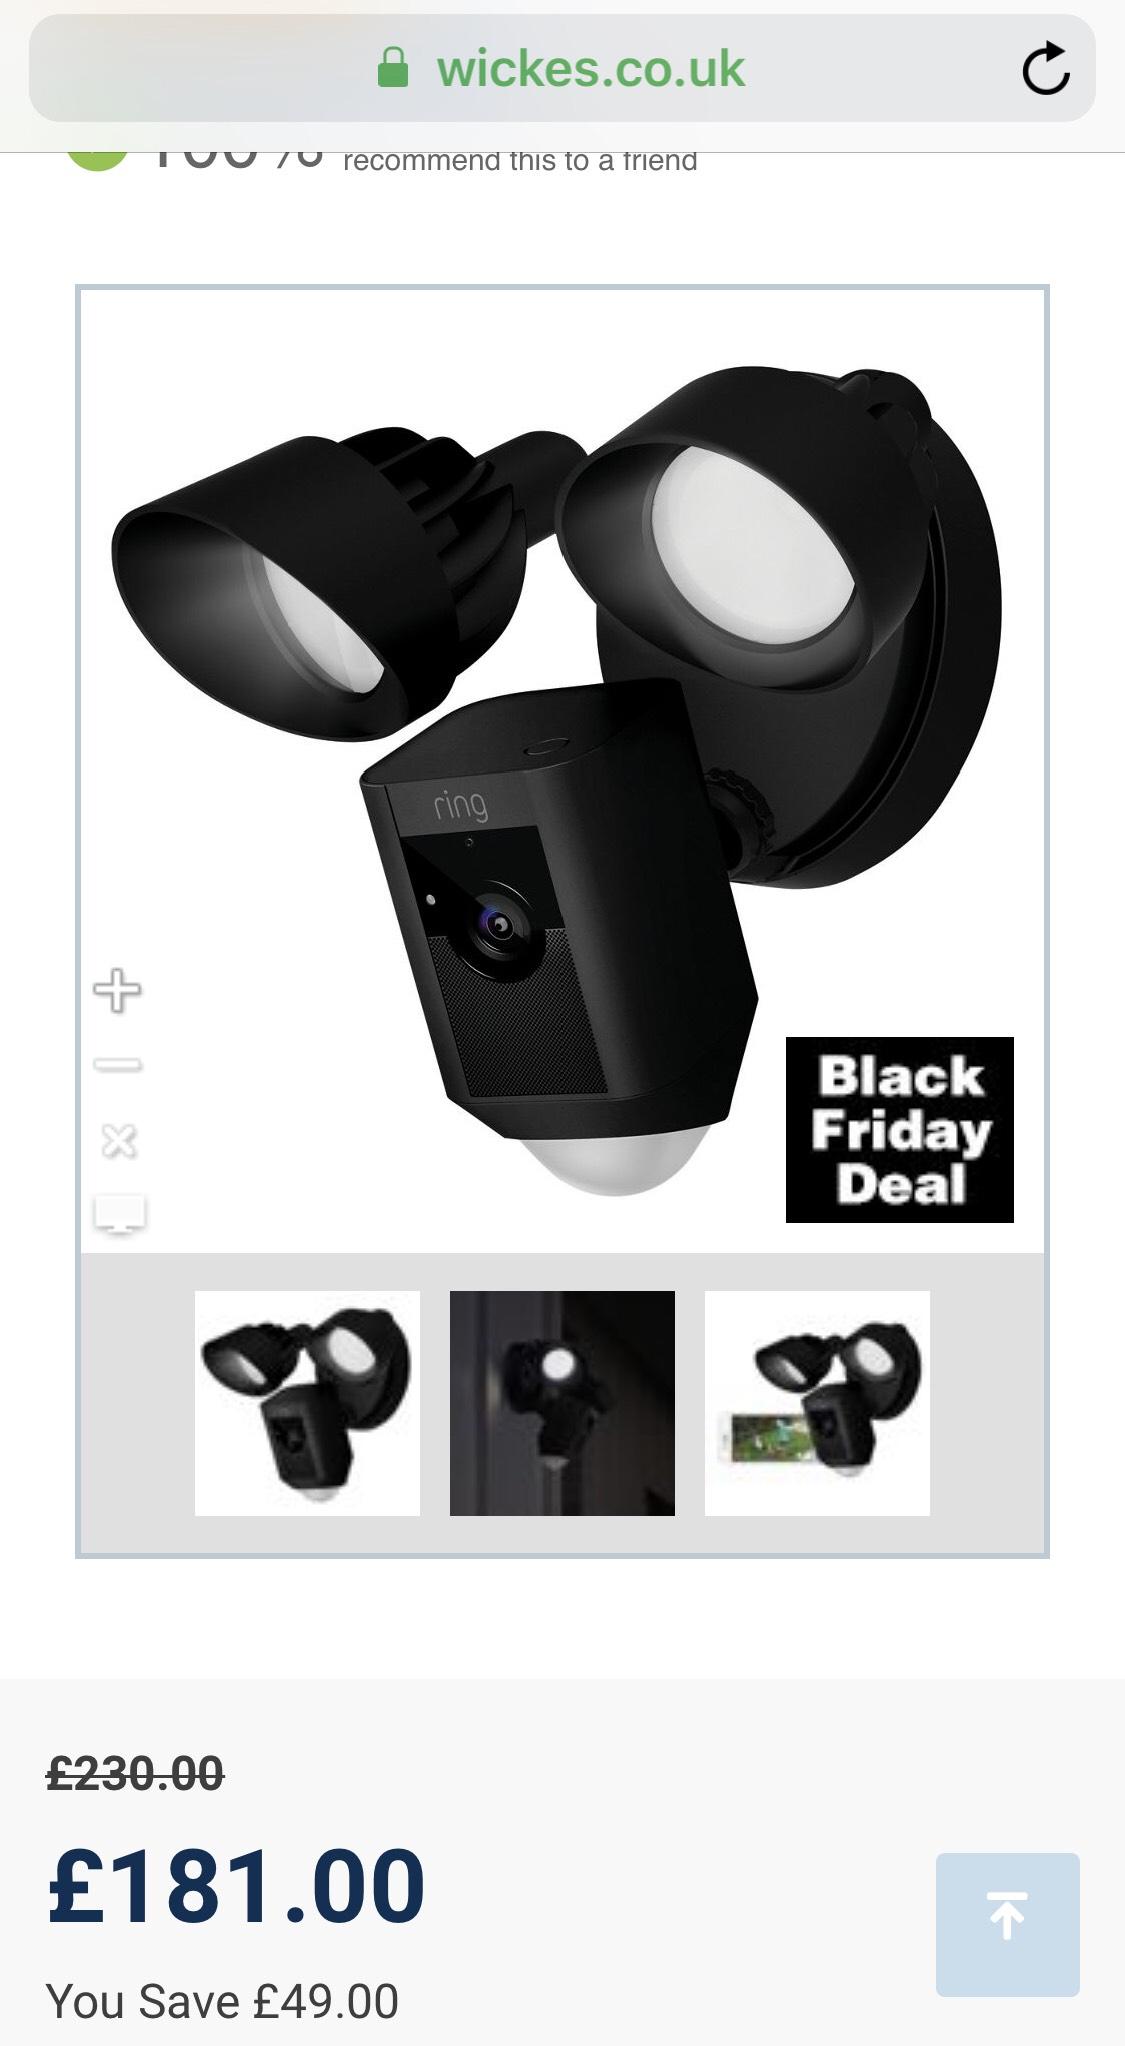 Ring outdoor floodlight camera £153.85 Wickes